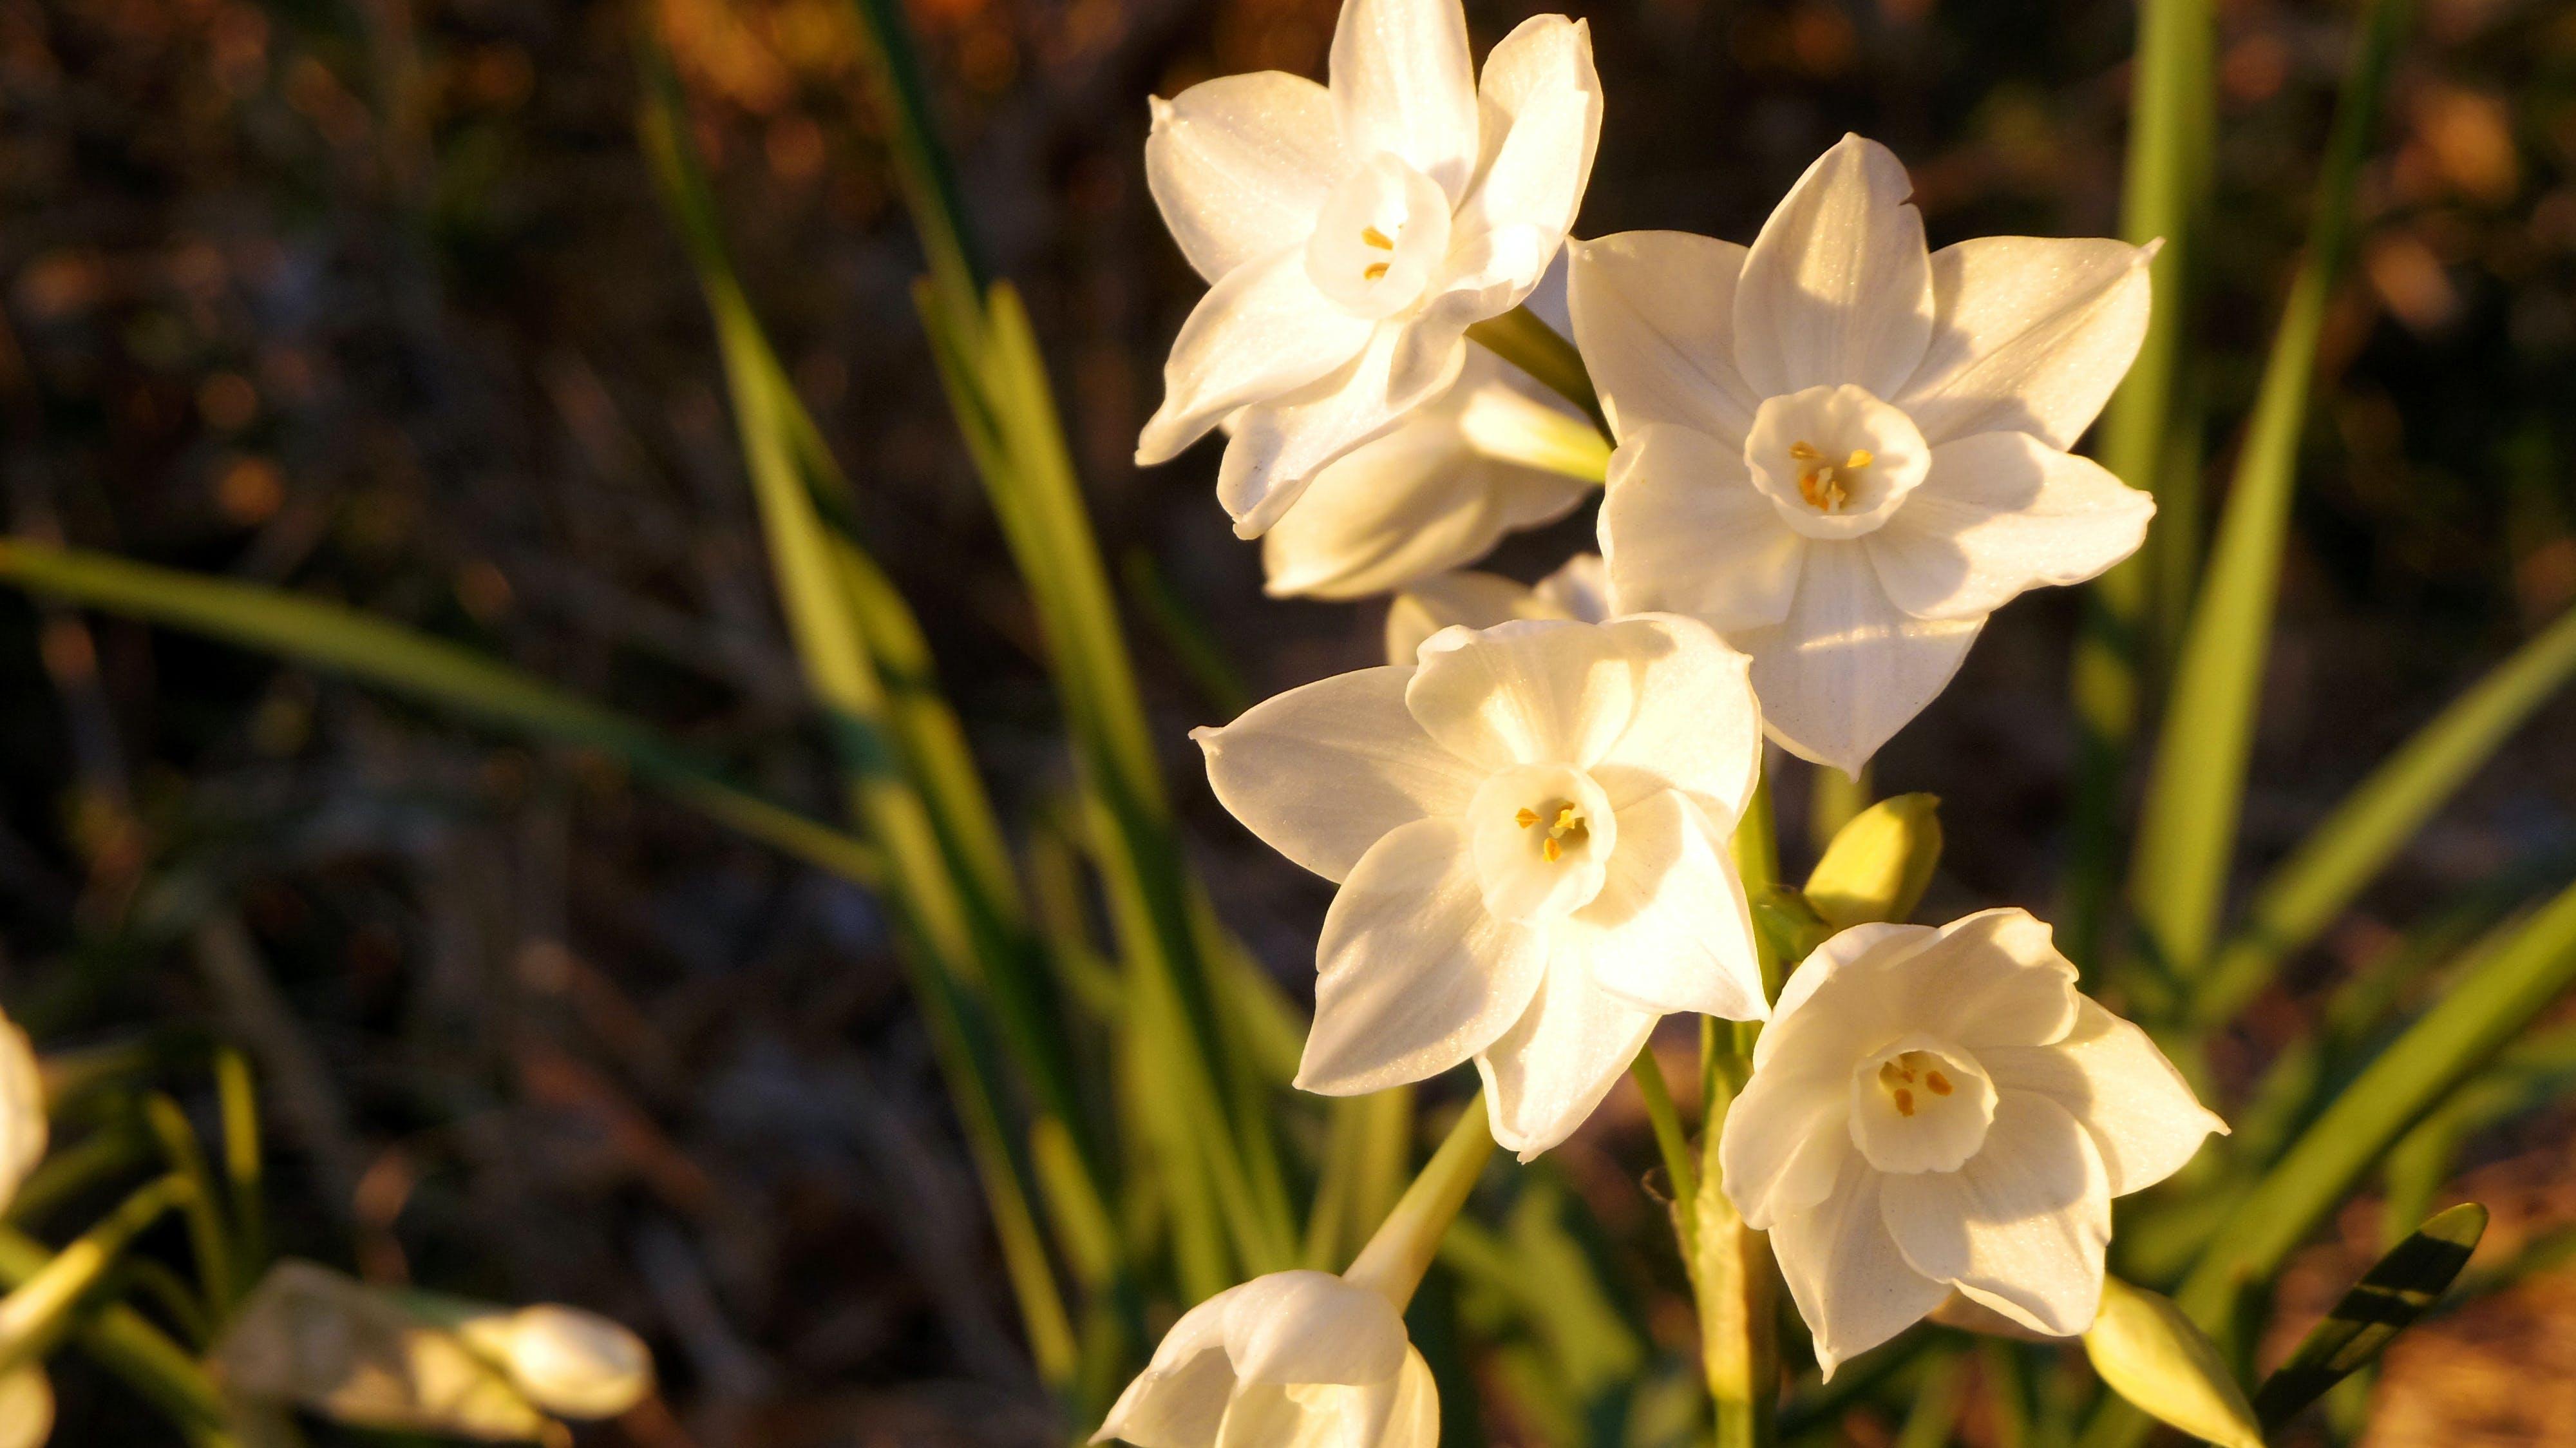 Free stock photo of narcissus, white